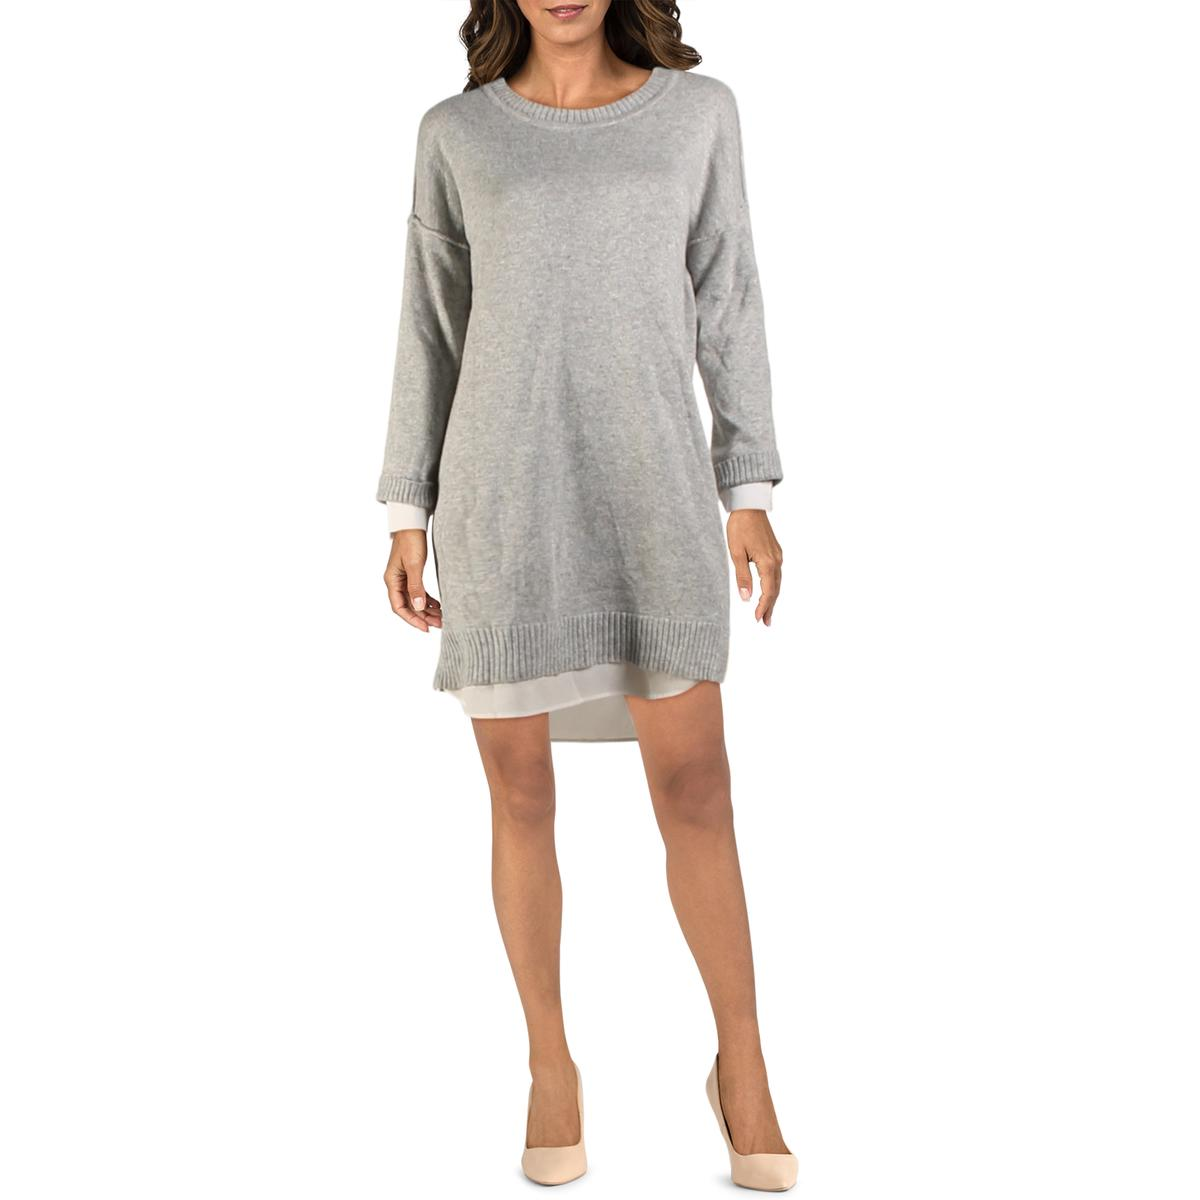 Nic Zoe Womens Elevated Studded Daytime Party Sweaterdress BHFO 1589